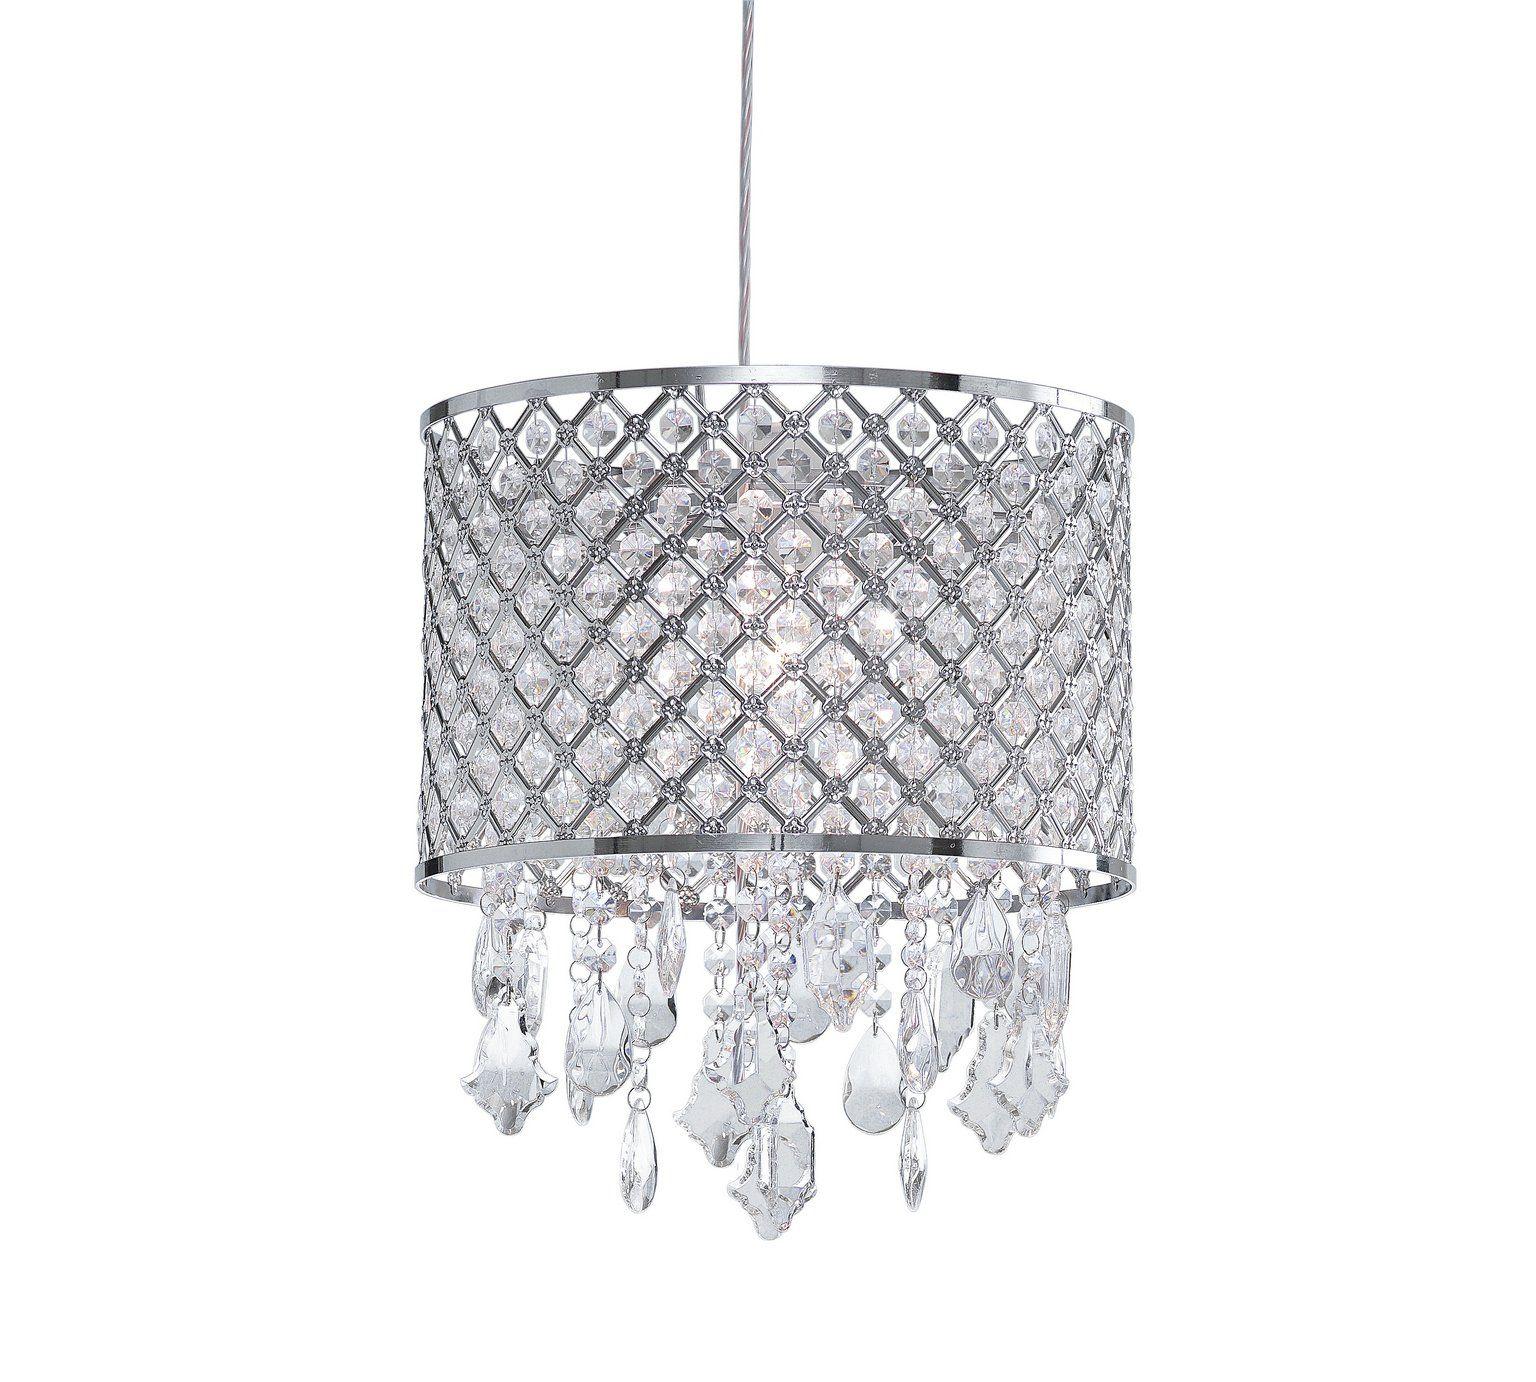 Buy heart of house tayten glass beaded chandelier chrome at argos buy heart of house tayten glass beaded chandelier chrome at argos aloadofball Gallery